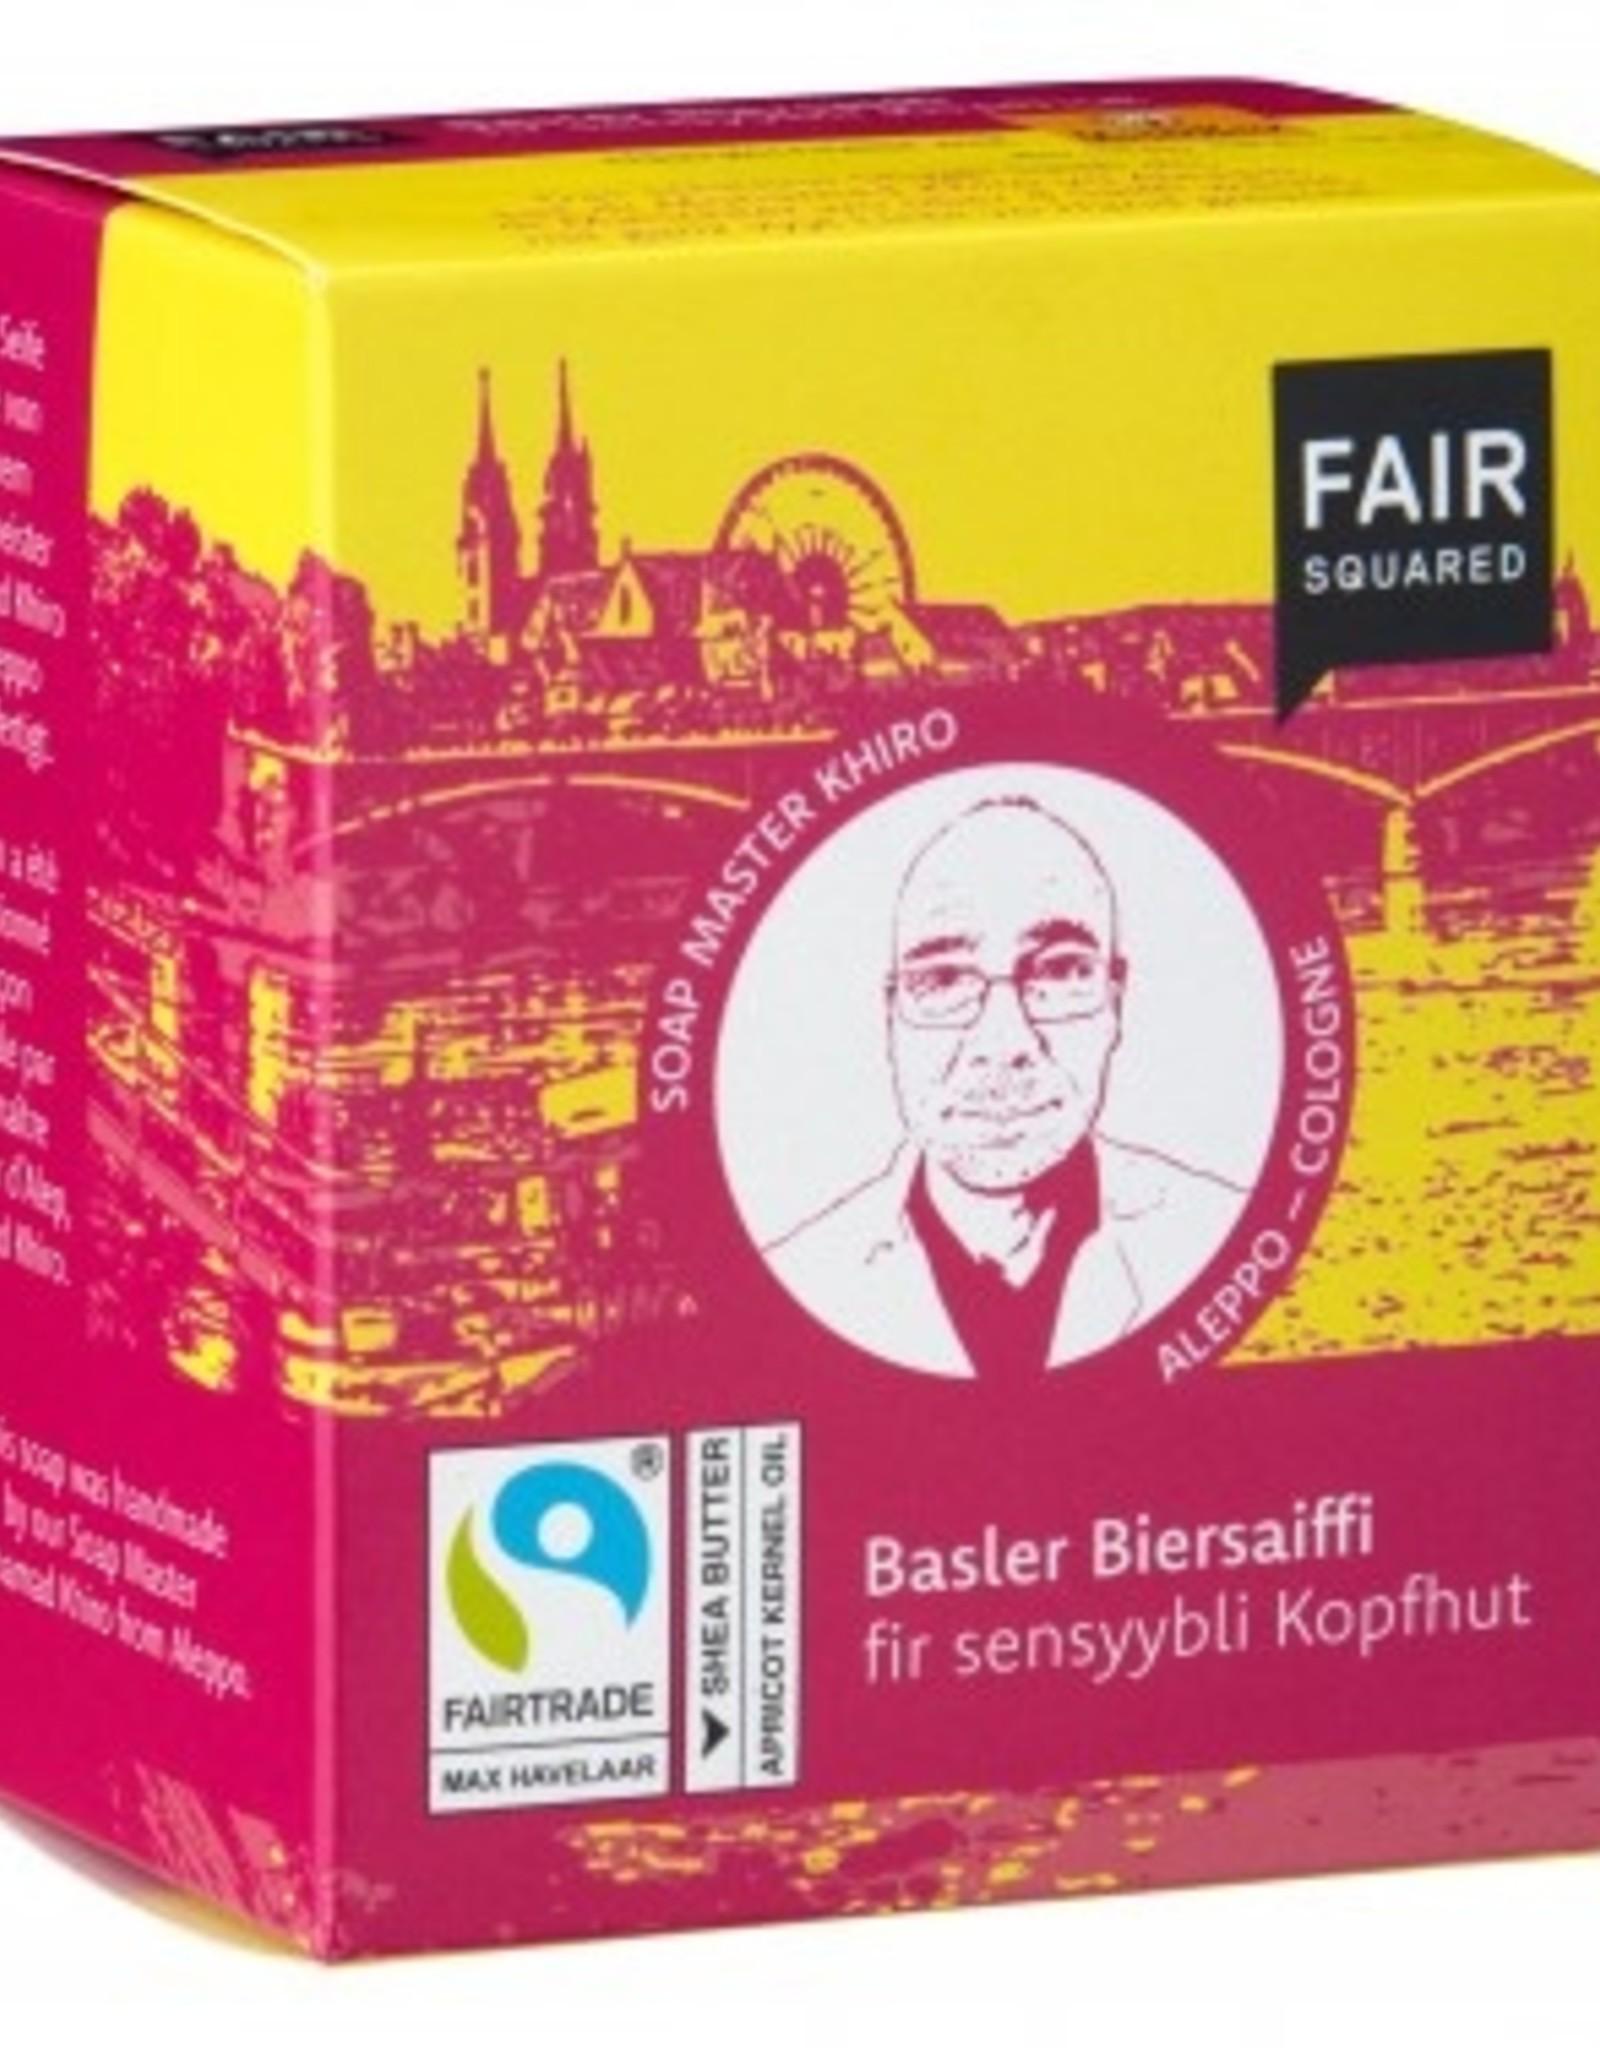 Basler Bierseife fir sensyybli Kopfhut vegan Basel/Köln